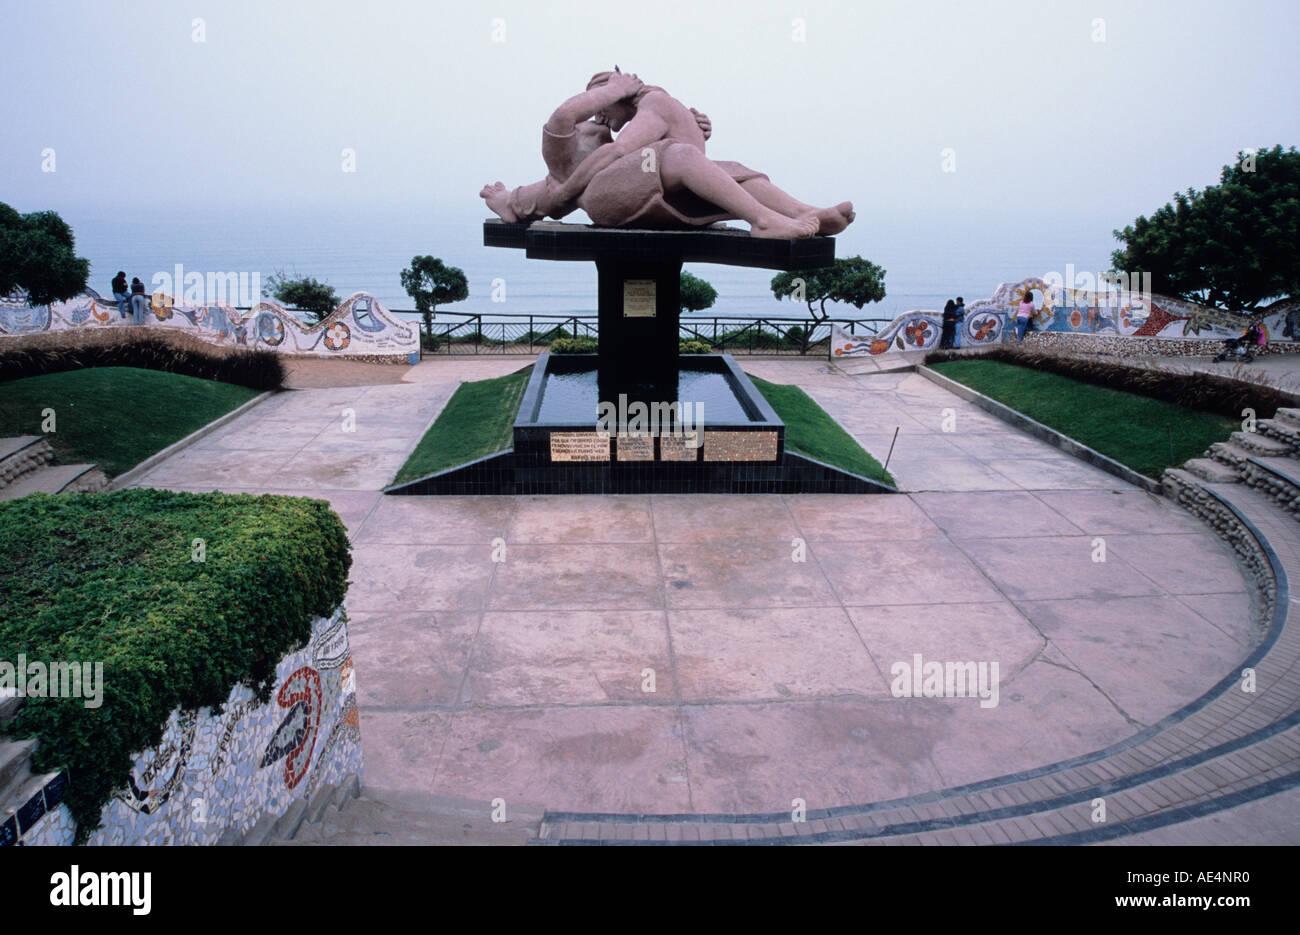 Parque del Amor Miraflores Lima Peru - Stock Image